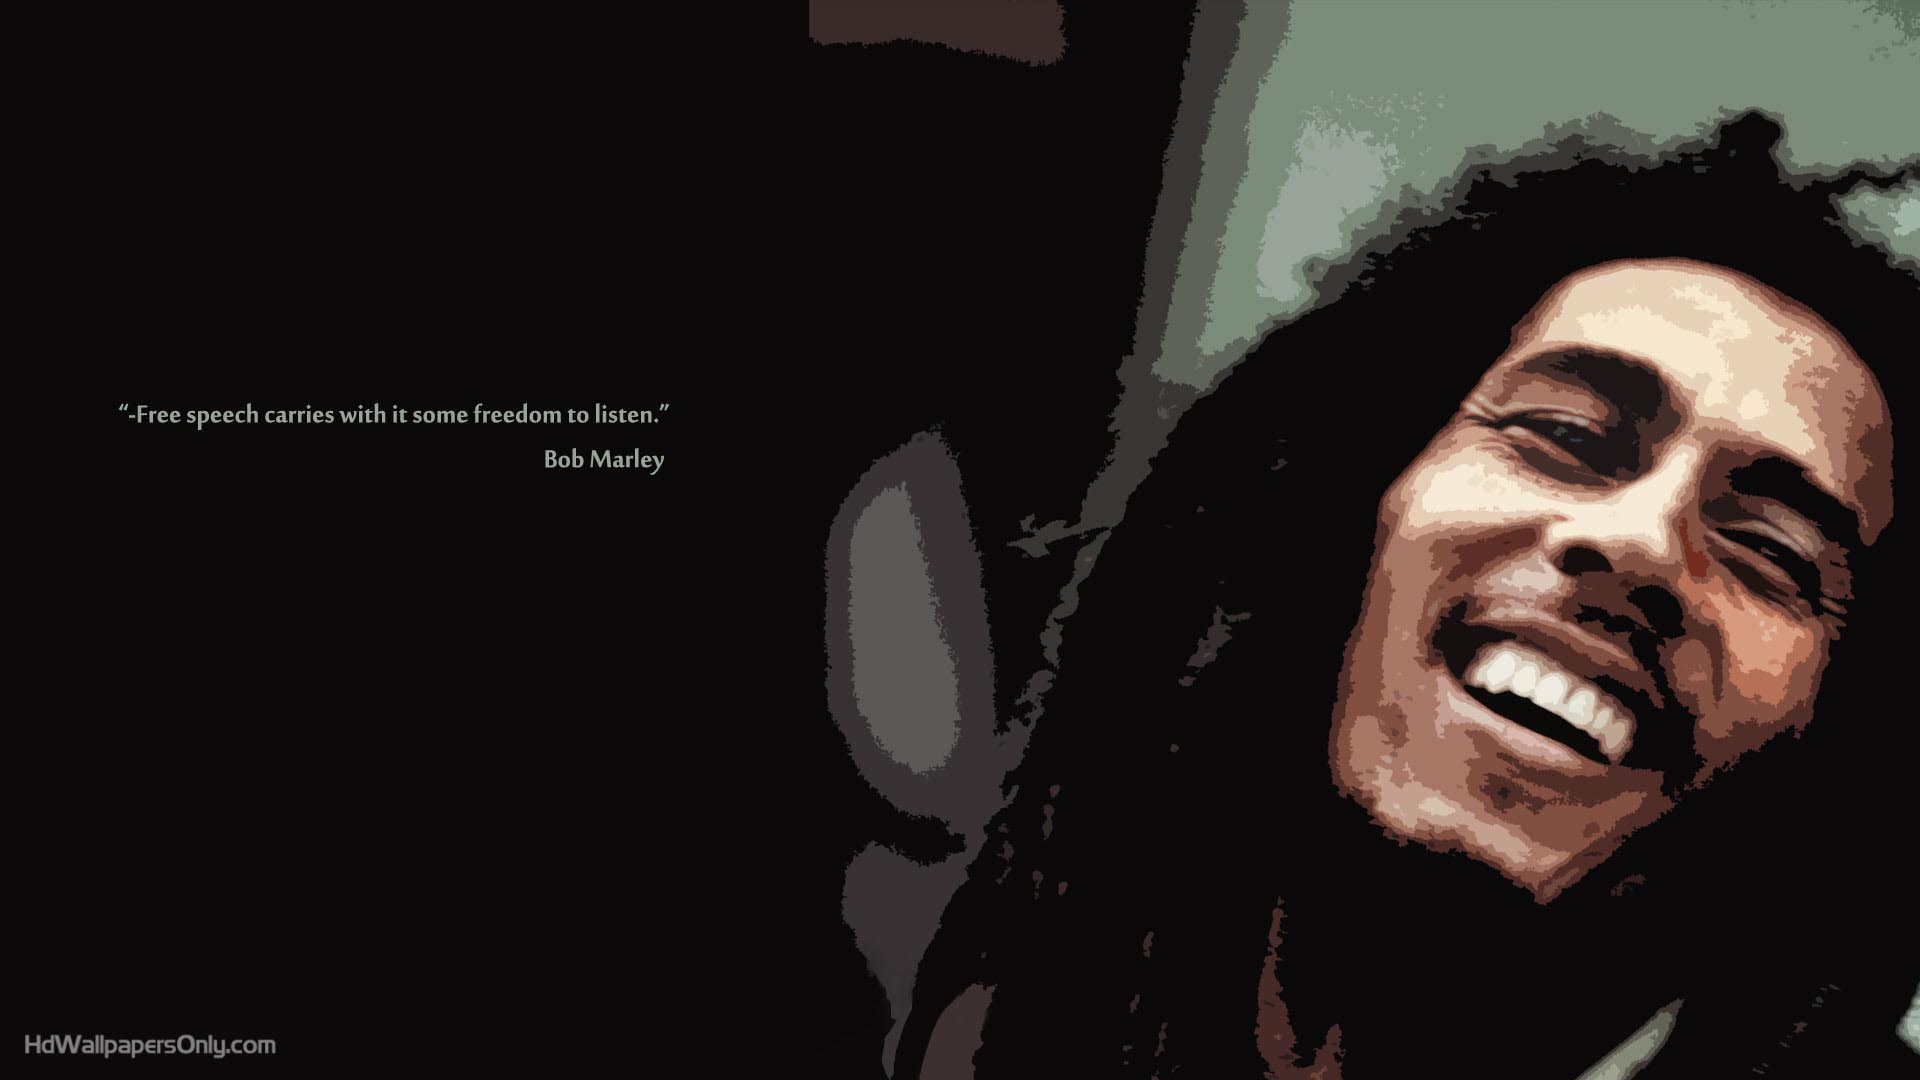 Bioshock Infinite Wallpaper Quote Bob Marley Hd S 1080p Hd Wallpaper